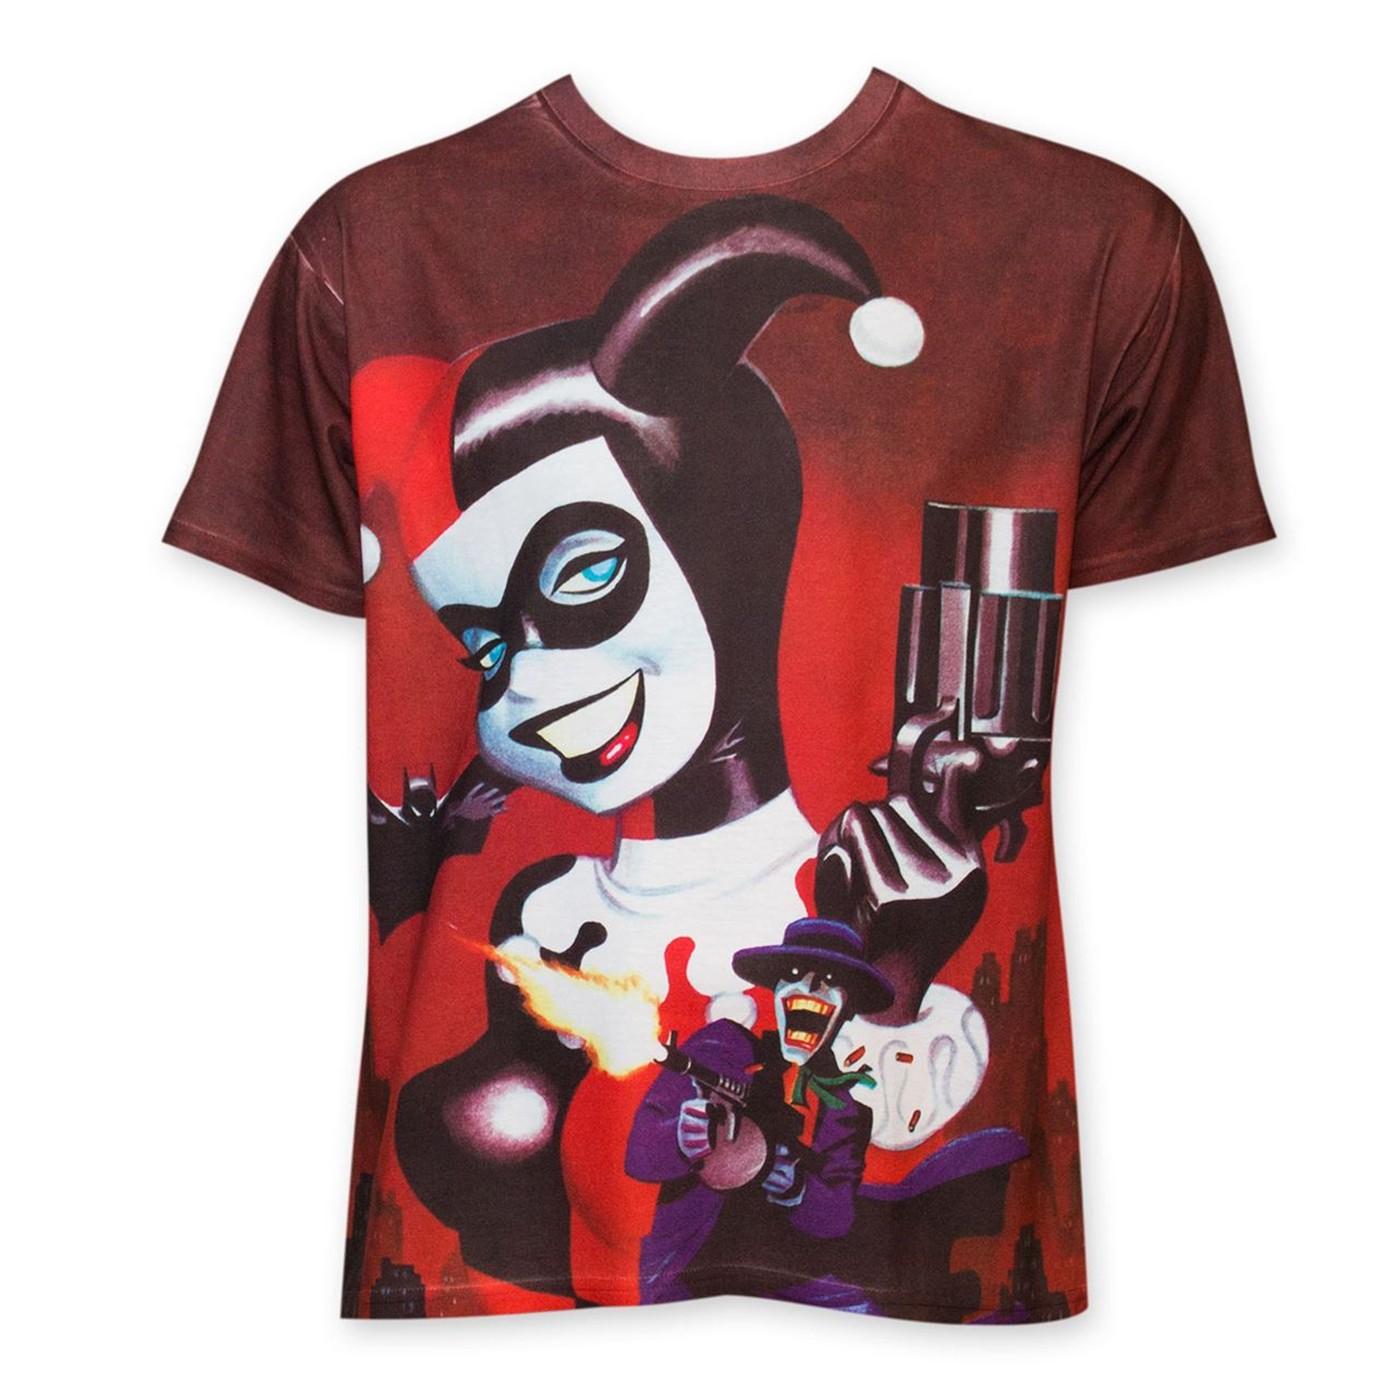 Harley Quinn Gun Sublimated Men's T-Shirt